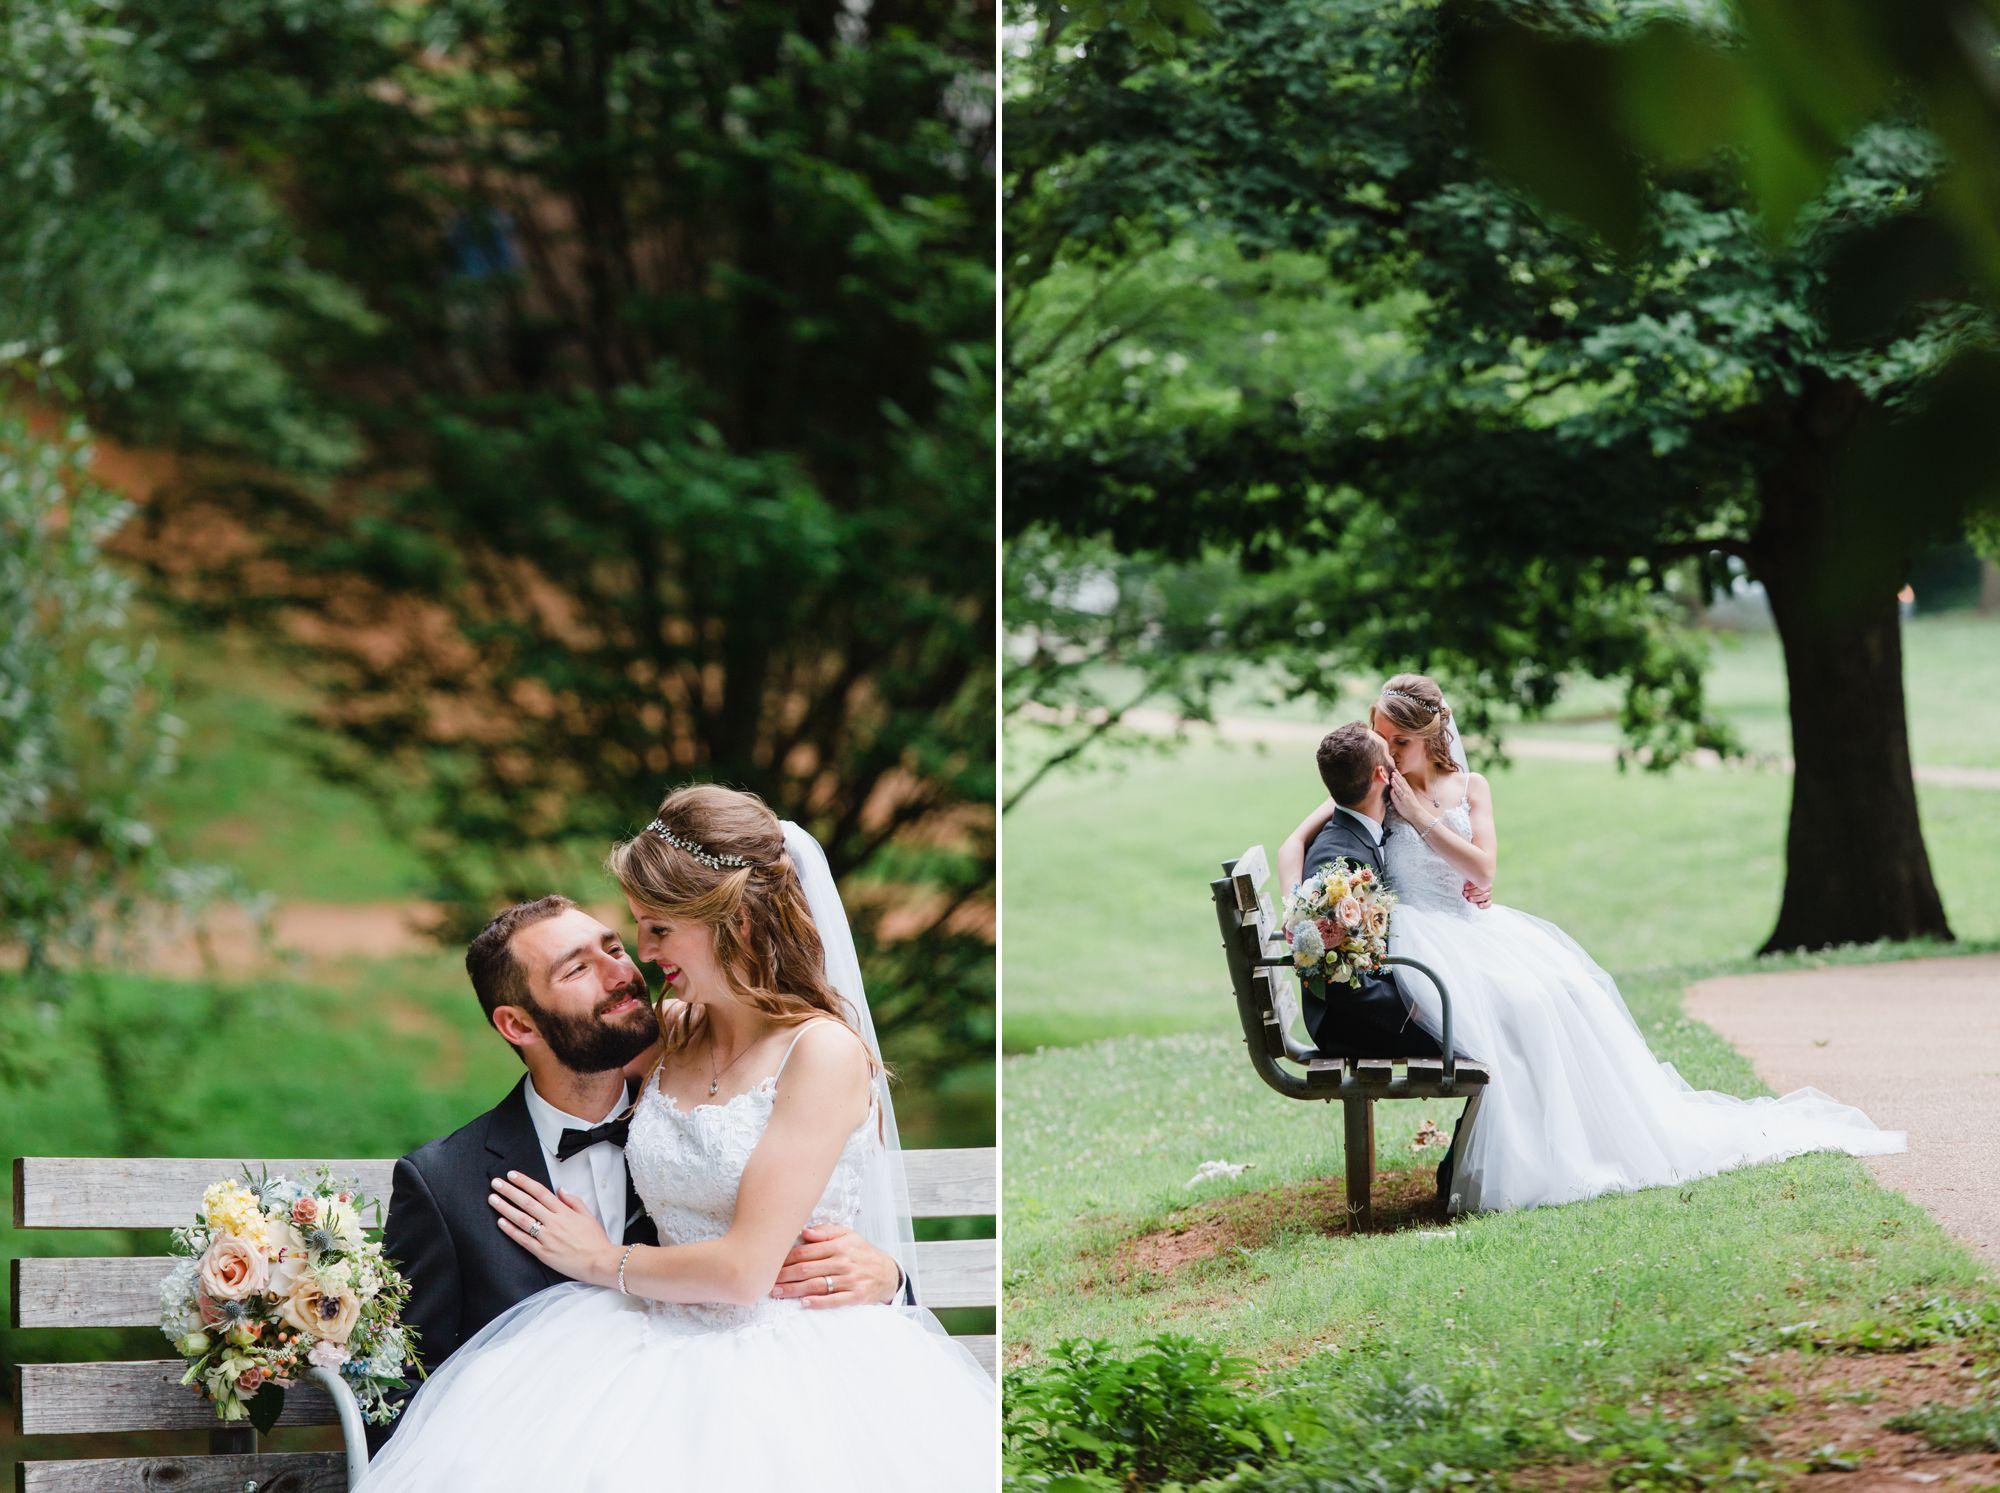 uptown-charlotte-orthodox-greek-wedding 84